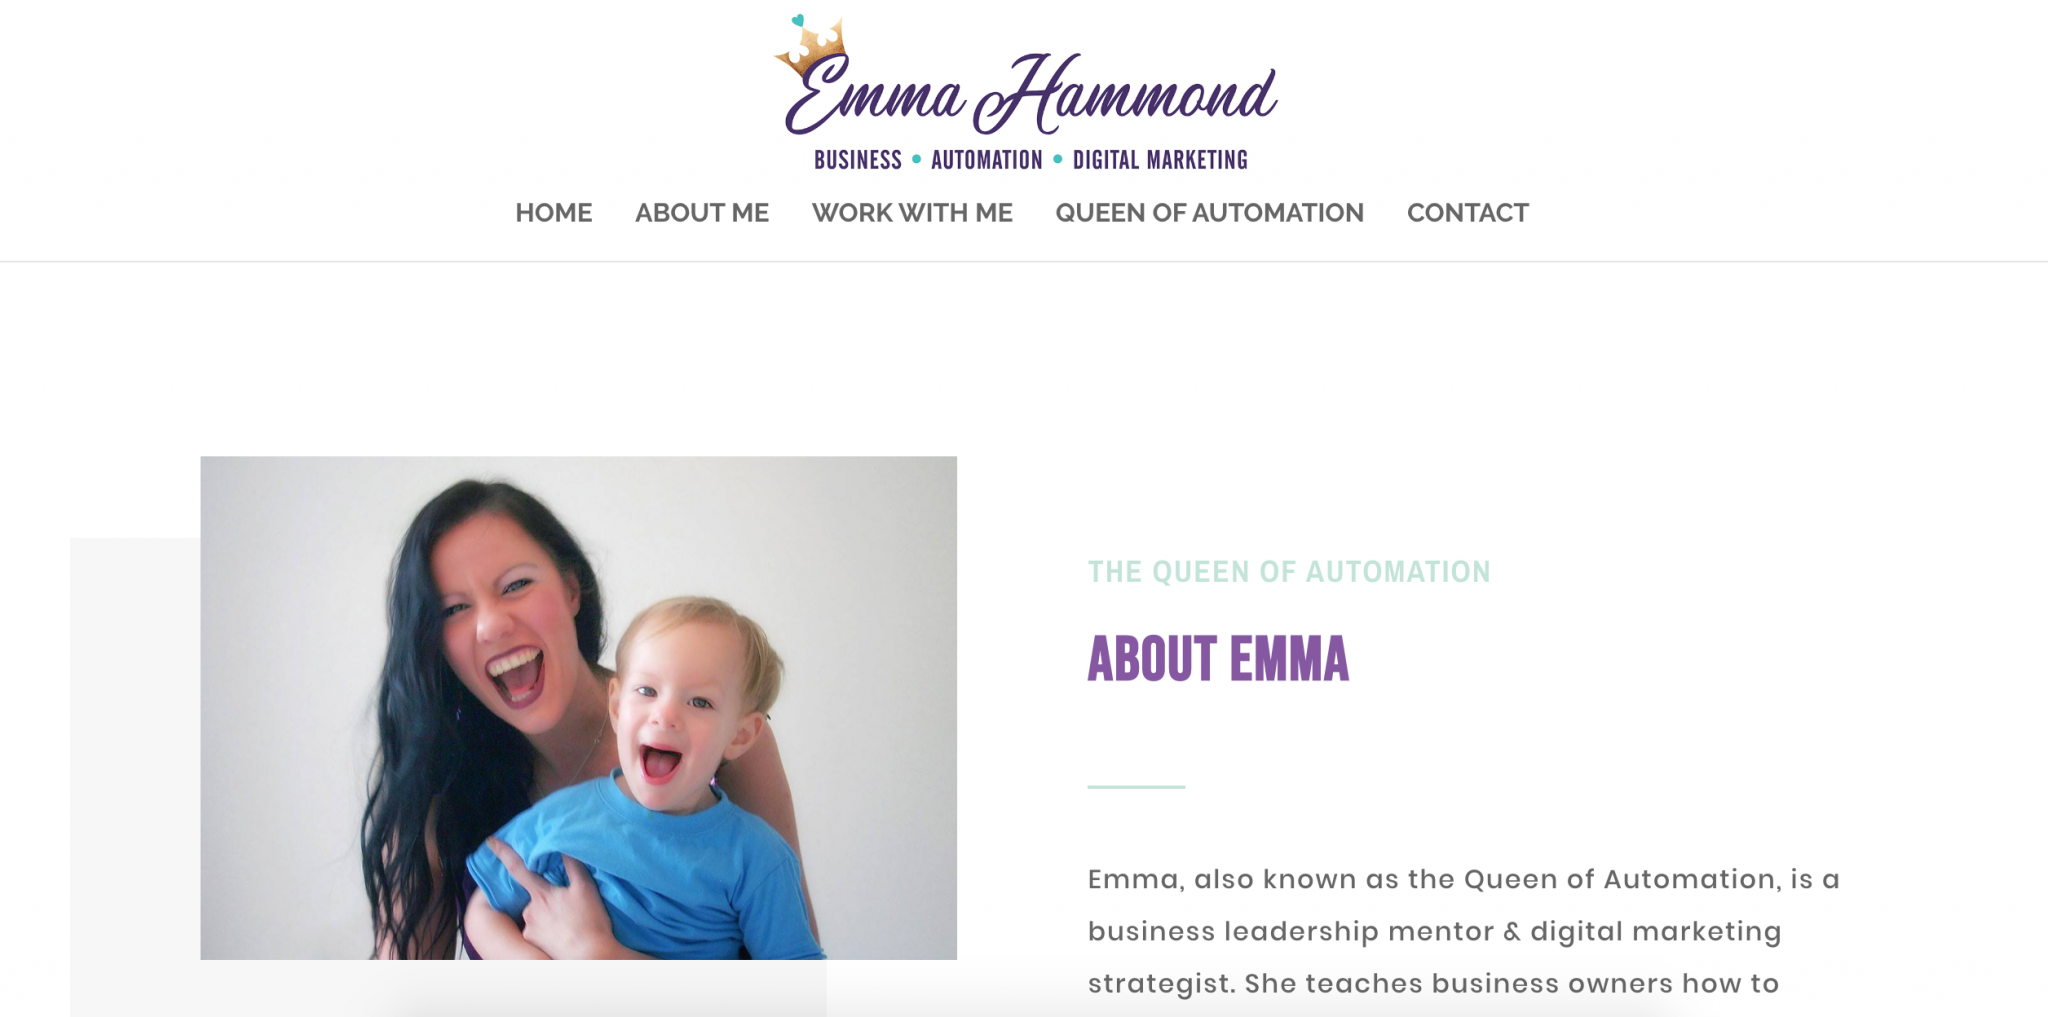 Emma Hammond Attraction Marketing Example | Attraction Marketing: 5 Ways to Attract More Qualified Leads